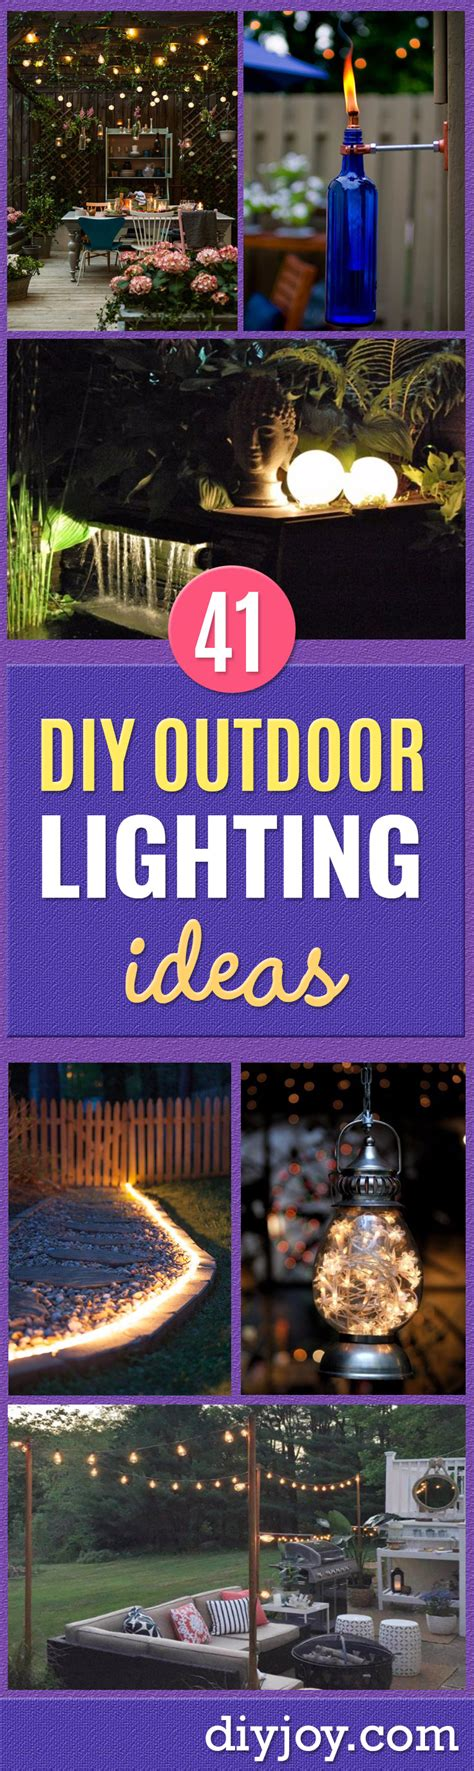 diy outdoor lighting ideas 41 diy outdoor lighting ideas